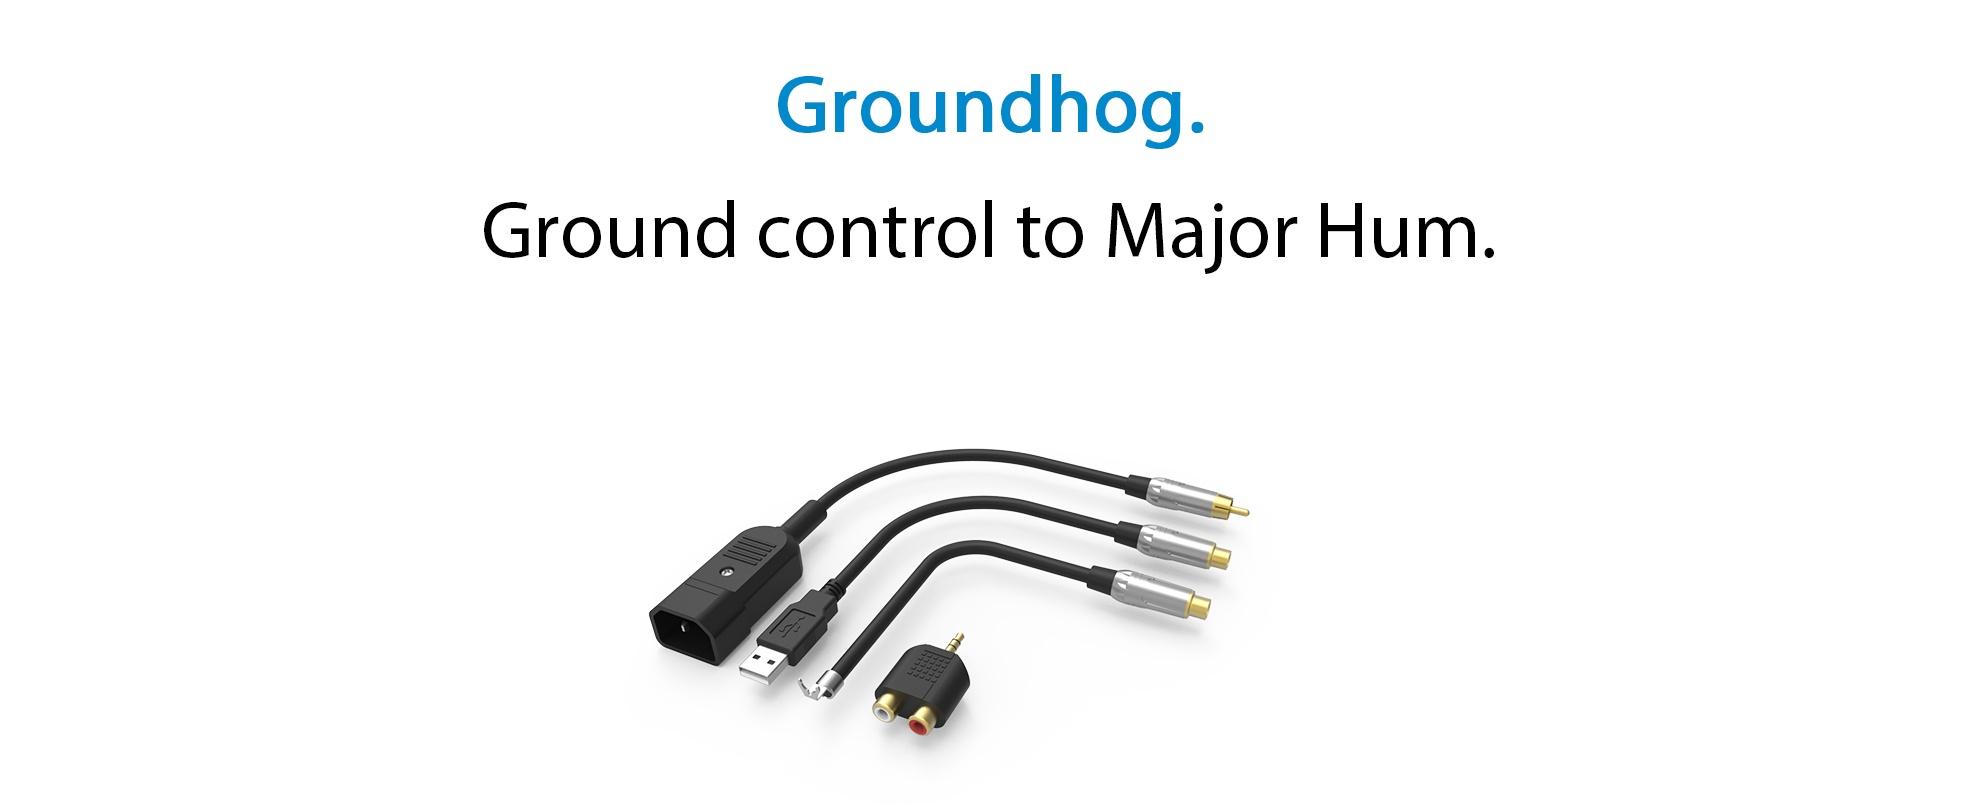 iFi Accessory Groundhog